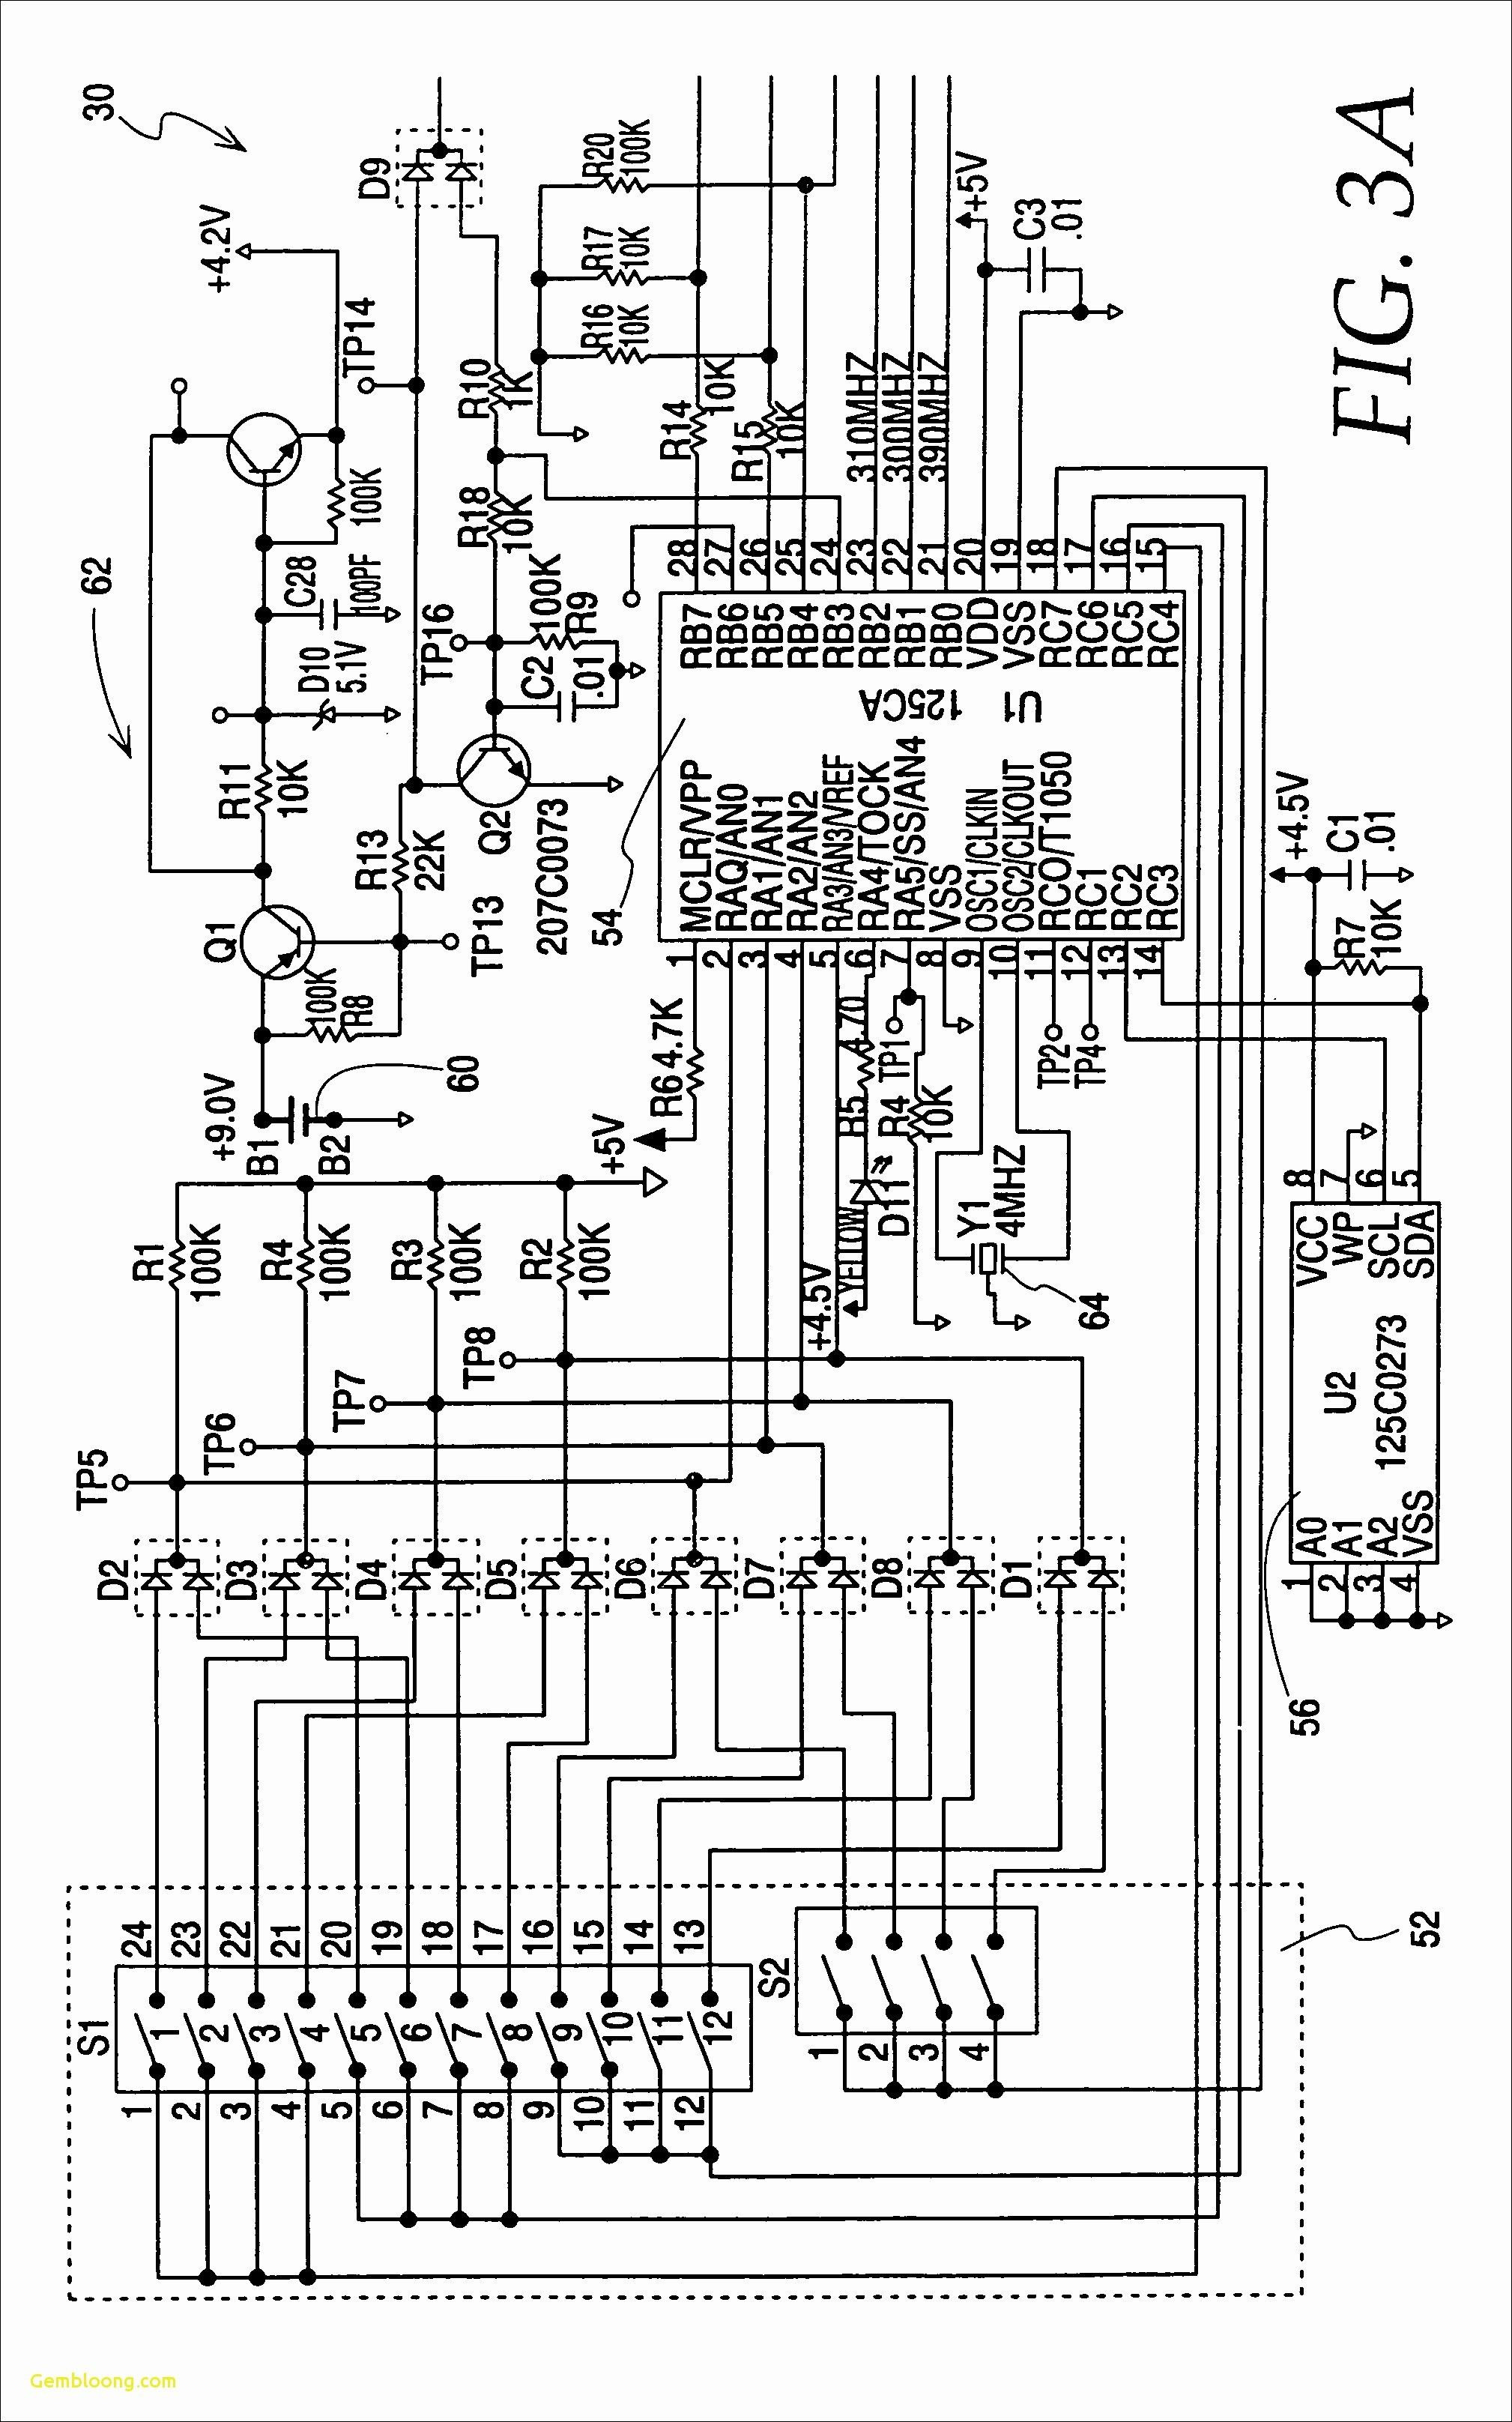 Unique Wiring Diagram For Mk Garage Kit Diagram Diagramsample Diagramtemplate Wiringdiagram Diagramch Garage Door Sensor Garage Door Opener Remote Diagram